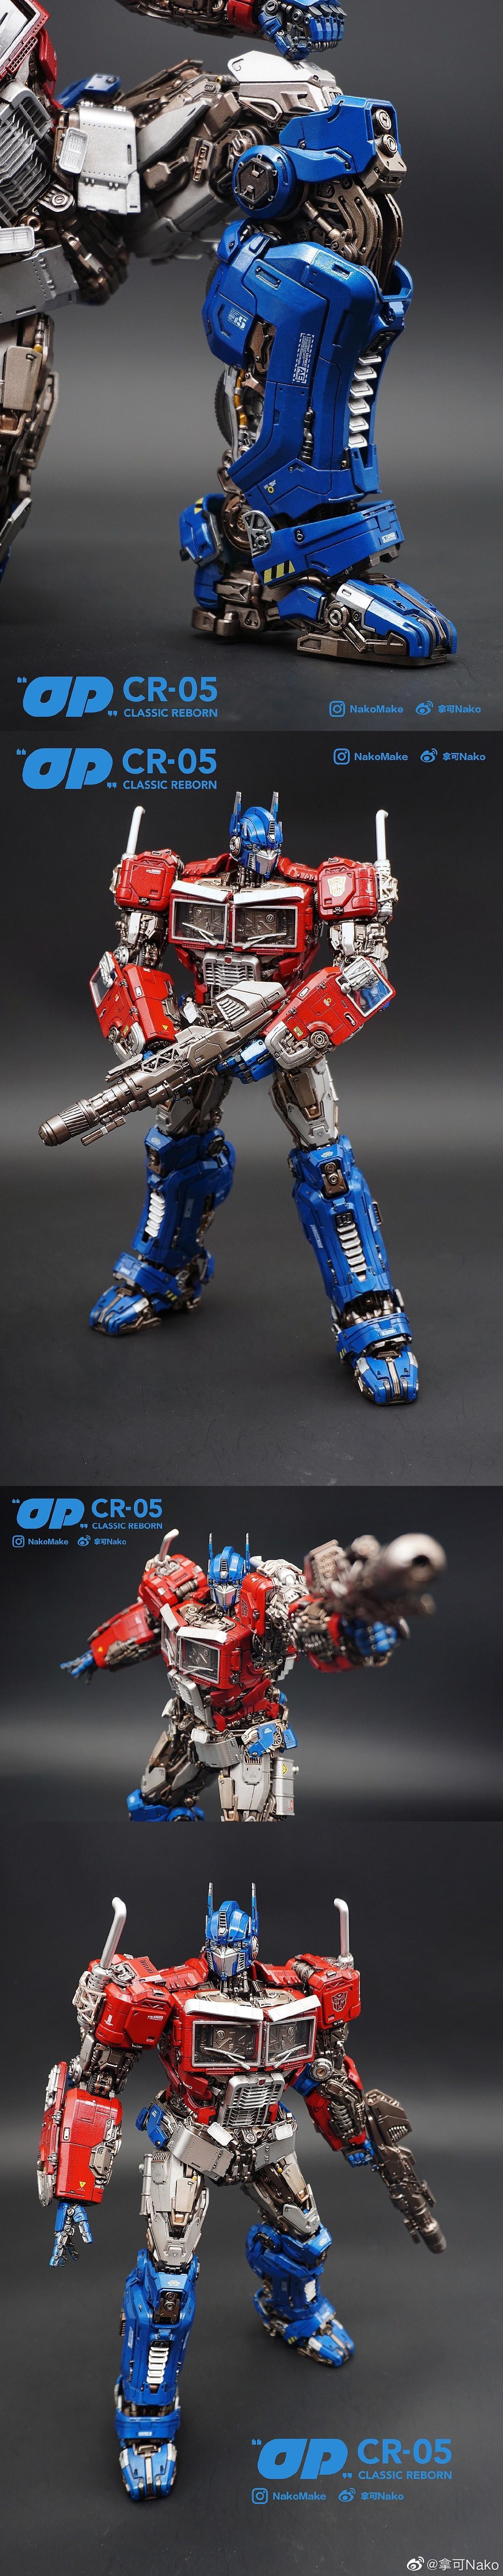 G798_NakoMake_Optimus_Prime_BUMBLEBEE_ver_GK_025_2.jpg